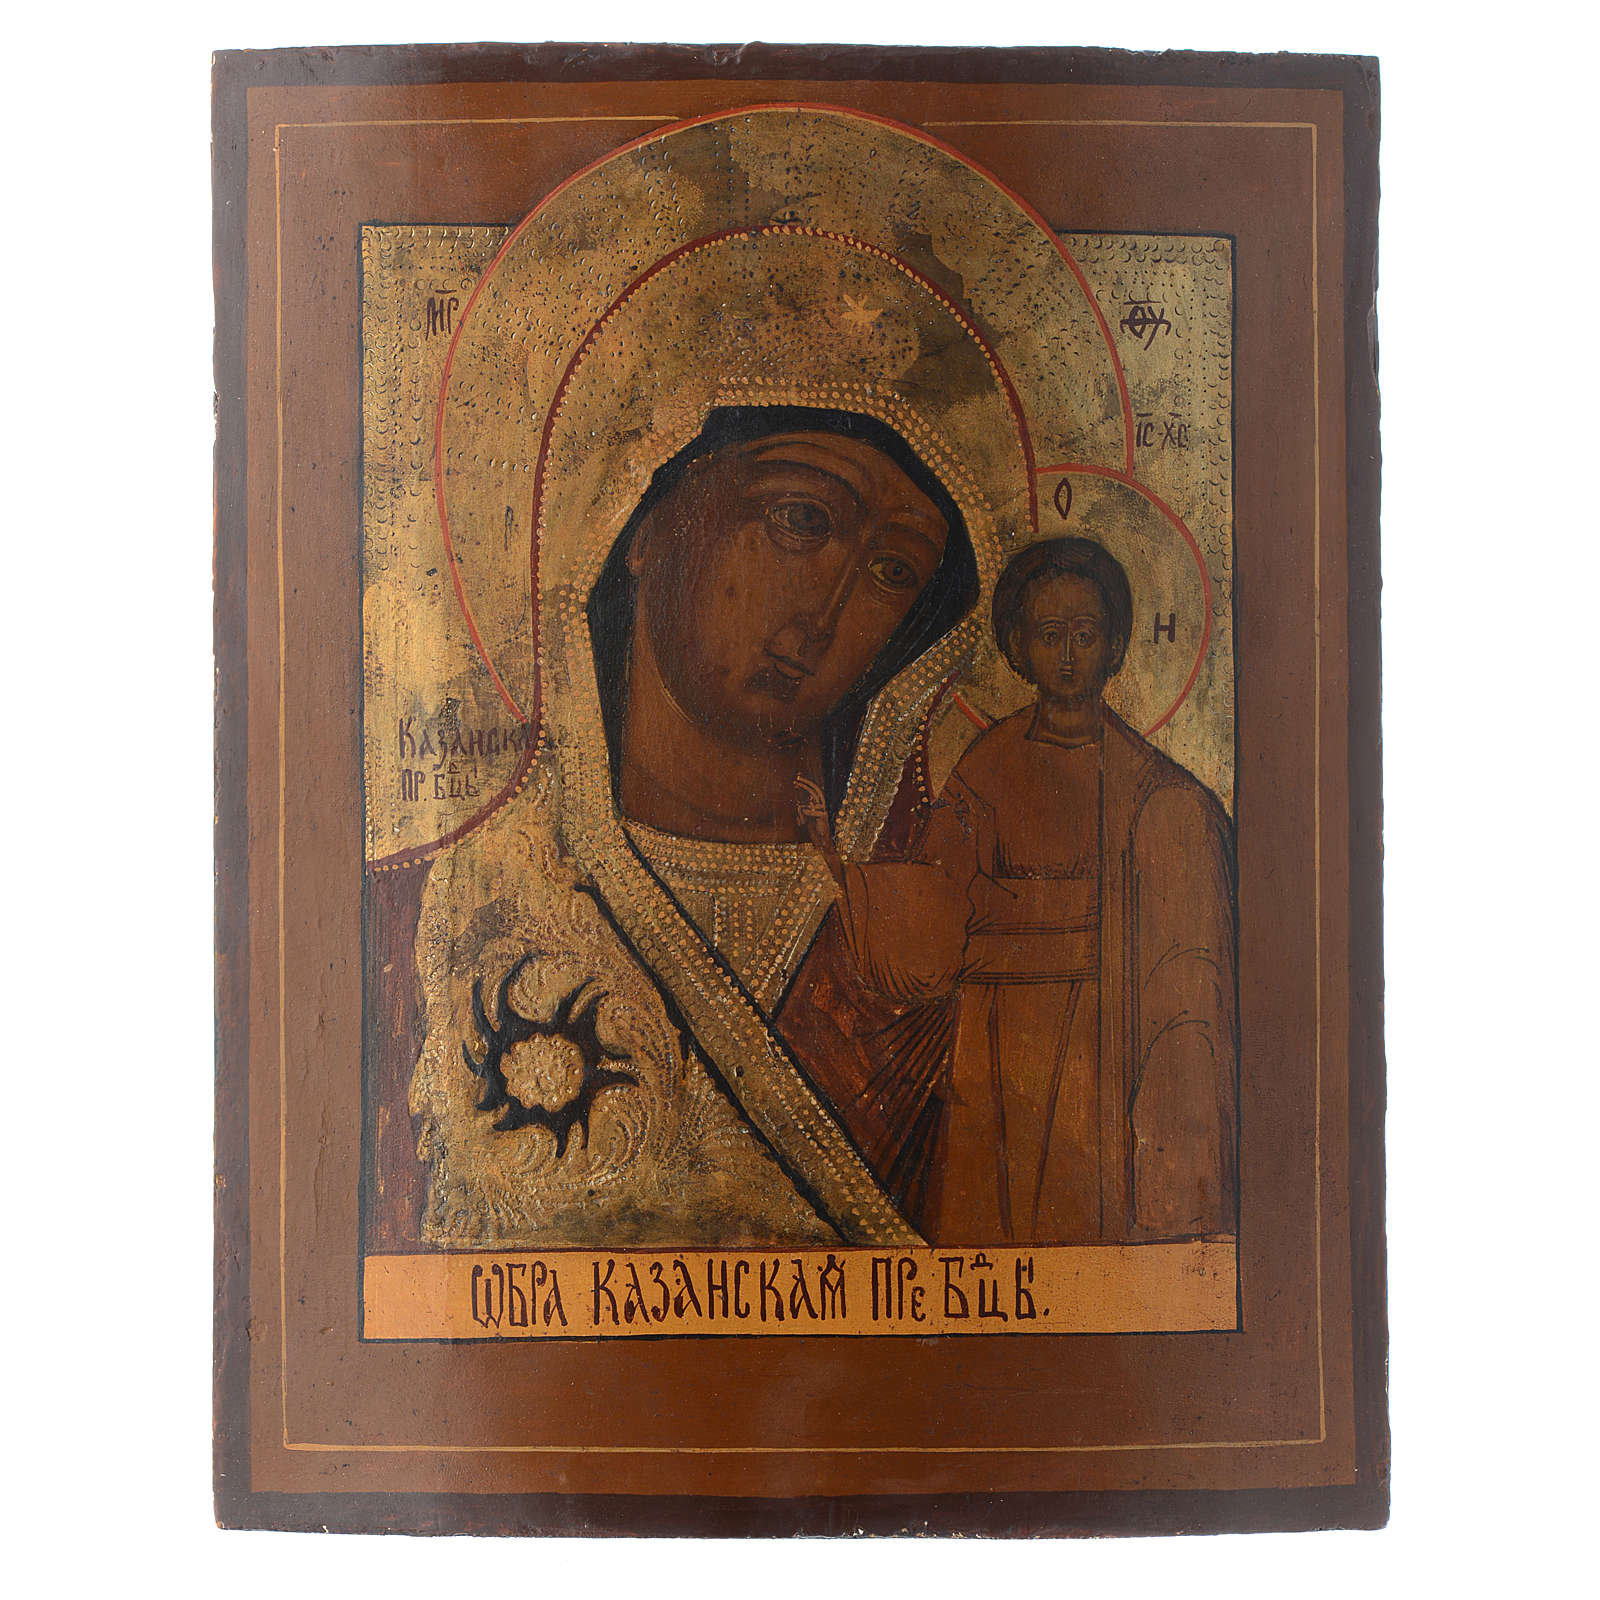 Ícone Kazanskaya séc. 19 40x30 cm antigo restaurado 4